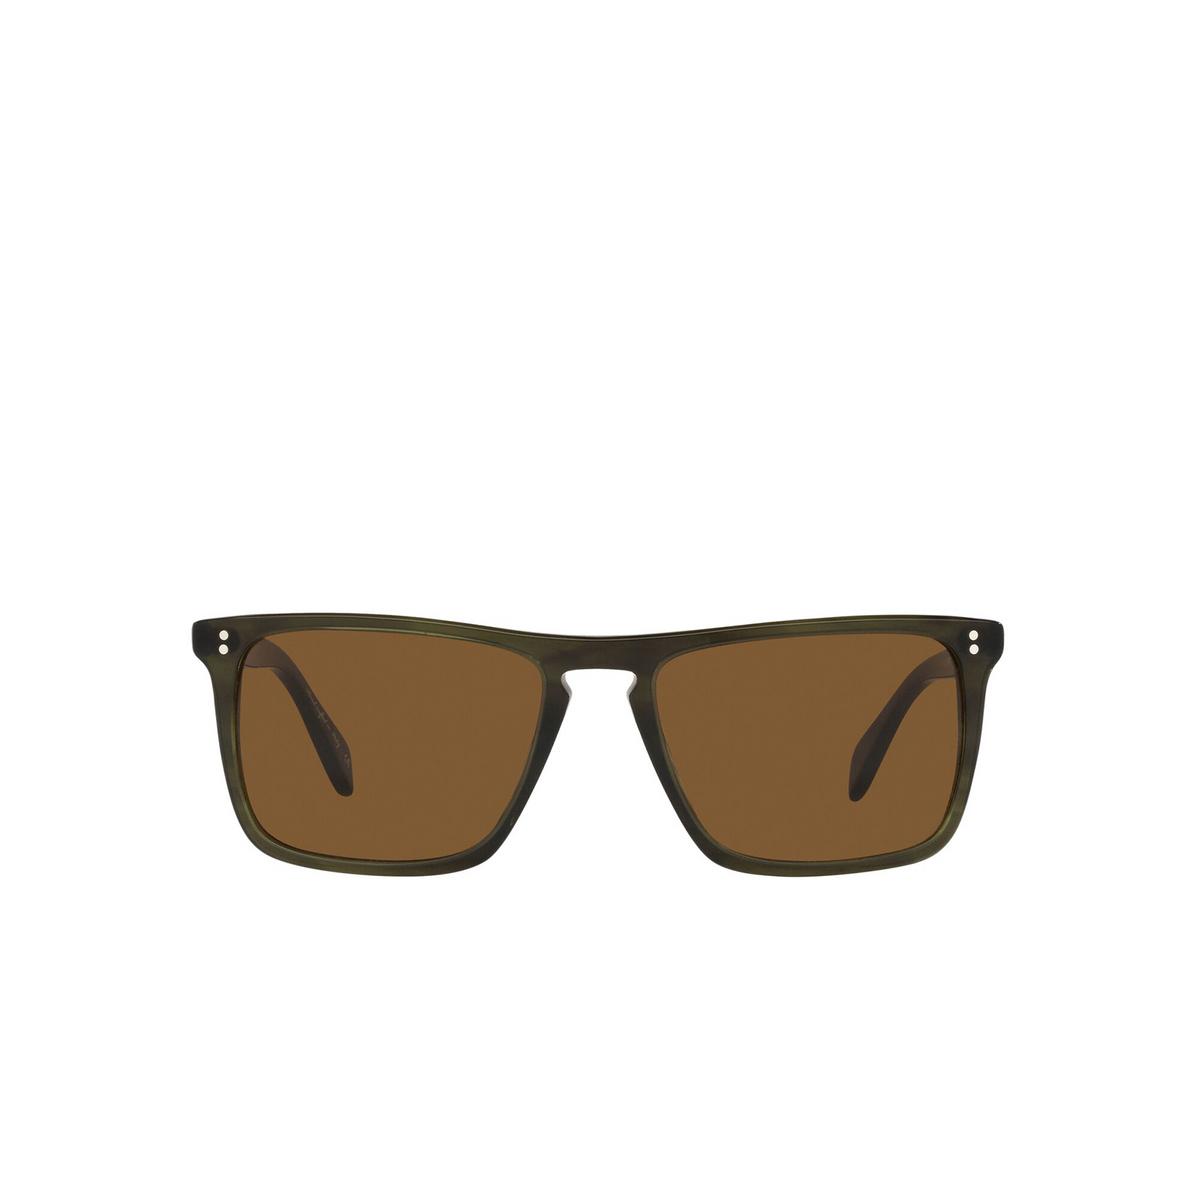 Oliver Peoples® Square Sunglasses: Bernardo OV5189S color Emerald Bark 168053 - front view.